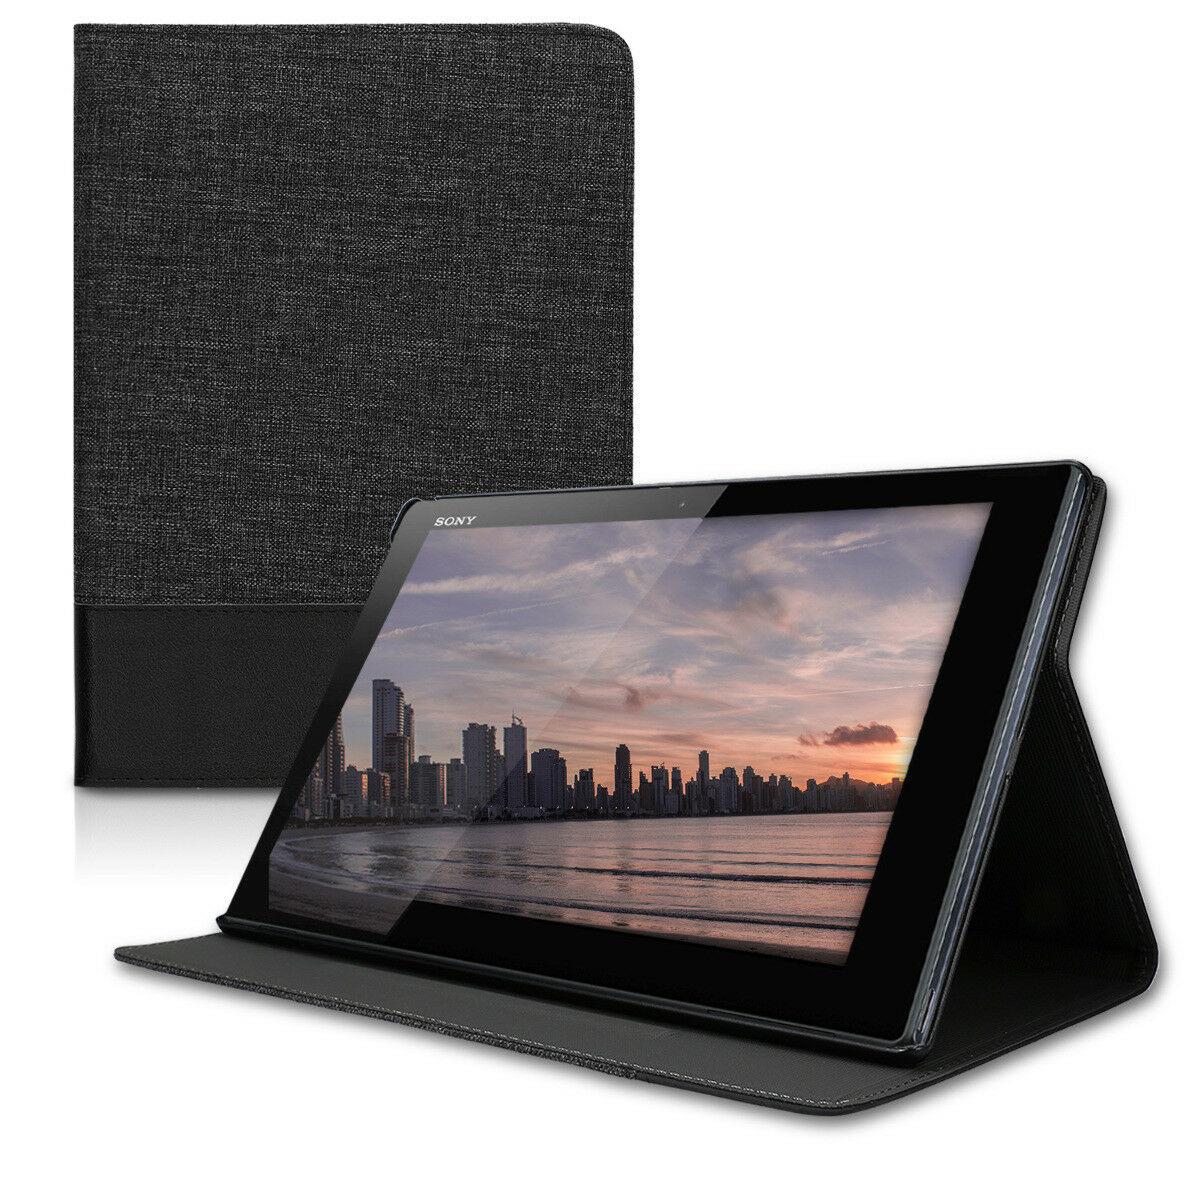 Pouzdro pro Sony Xperia Z4 Tablet černé